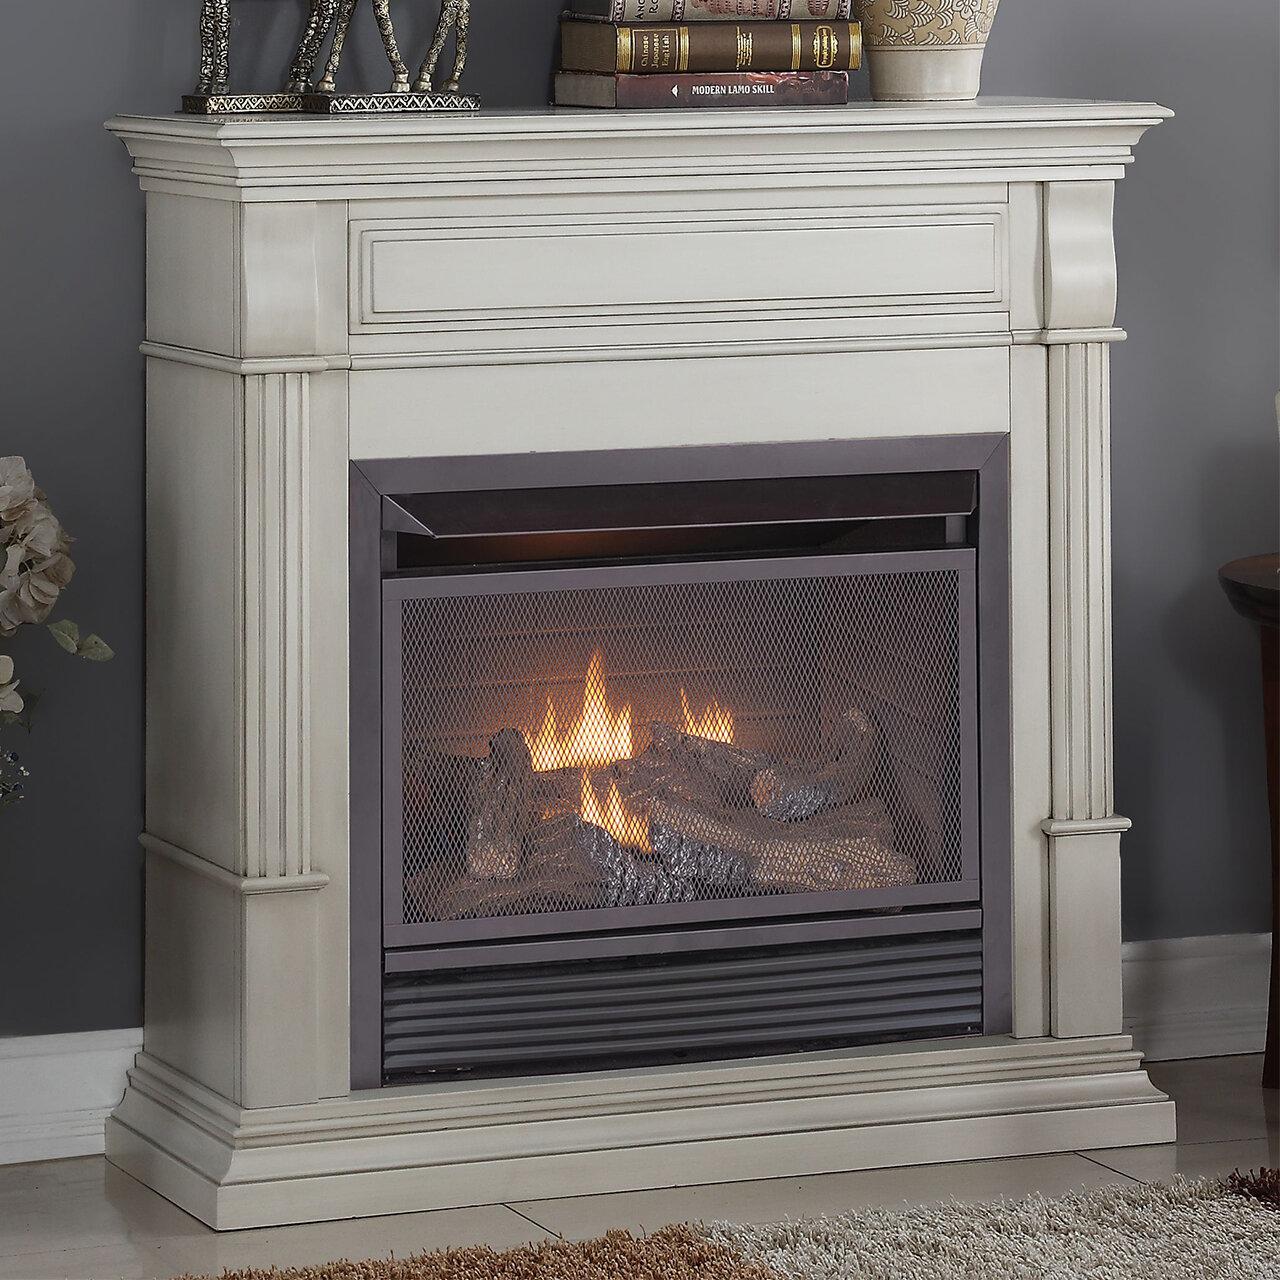 duluth forge vent free natural gas propane fireplace reviews wayfair rh wayfair com propane ventless fireplace with mantel ventless propane fireplaces safe